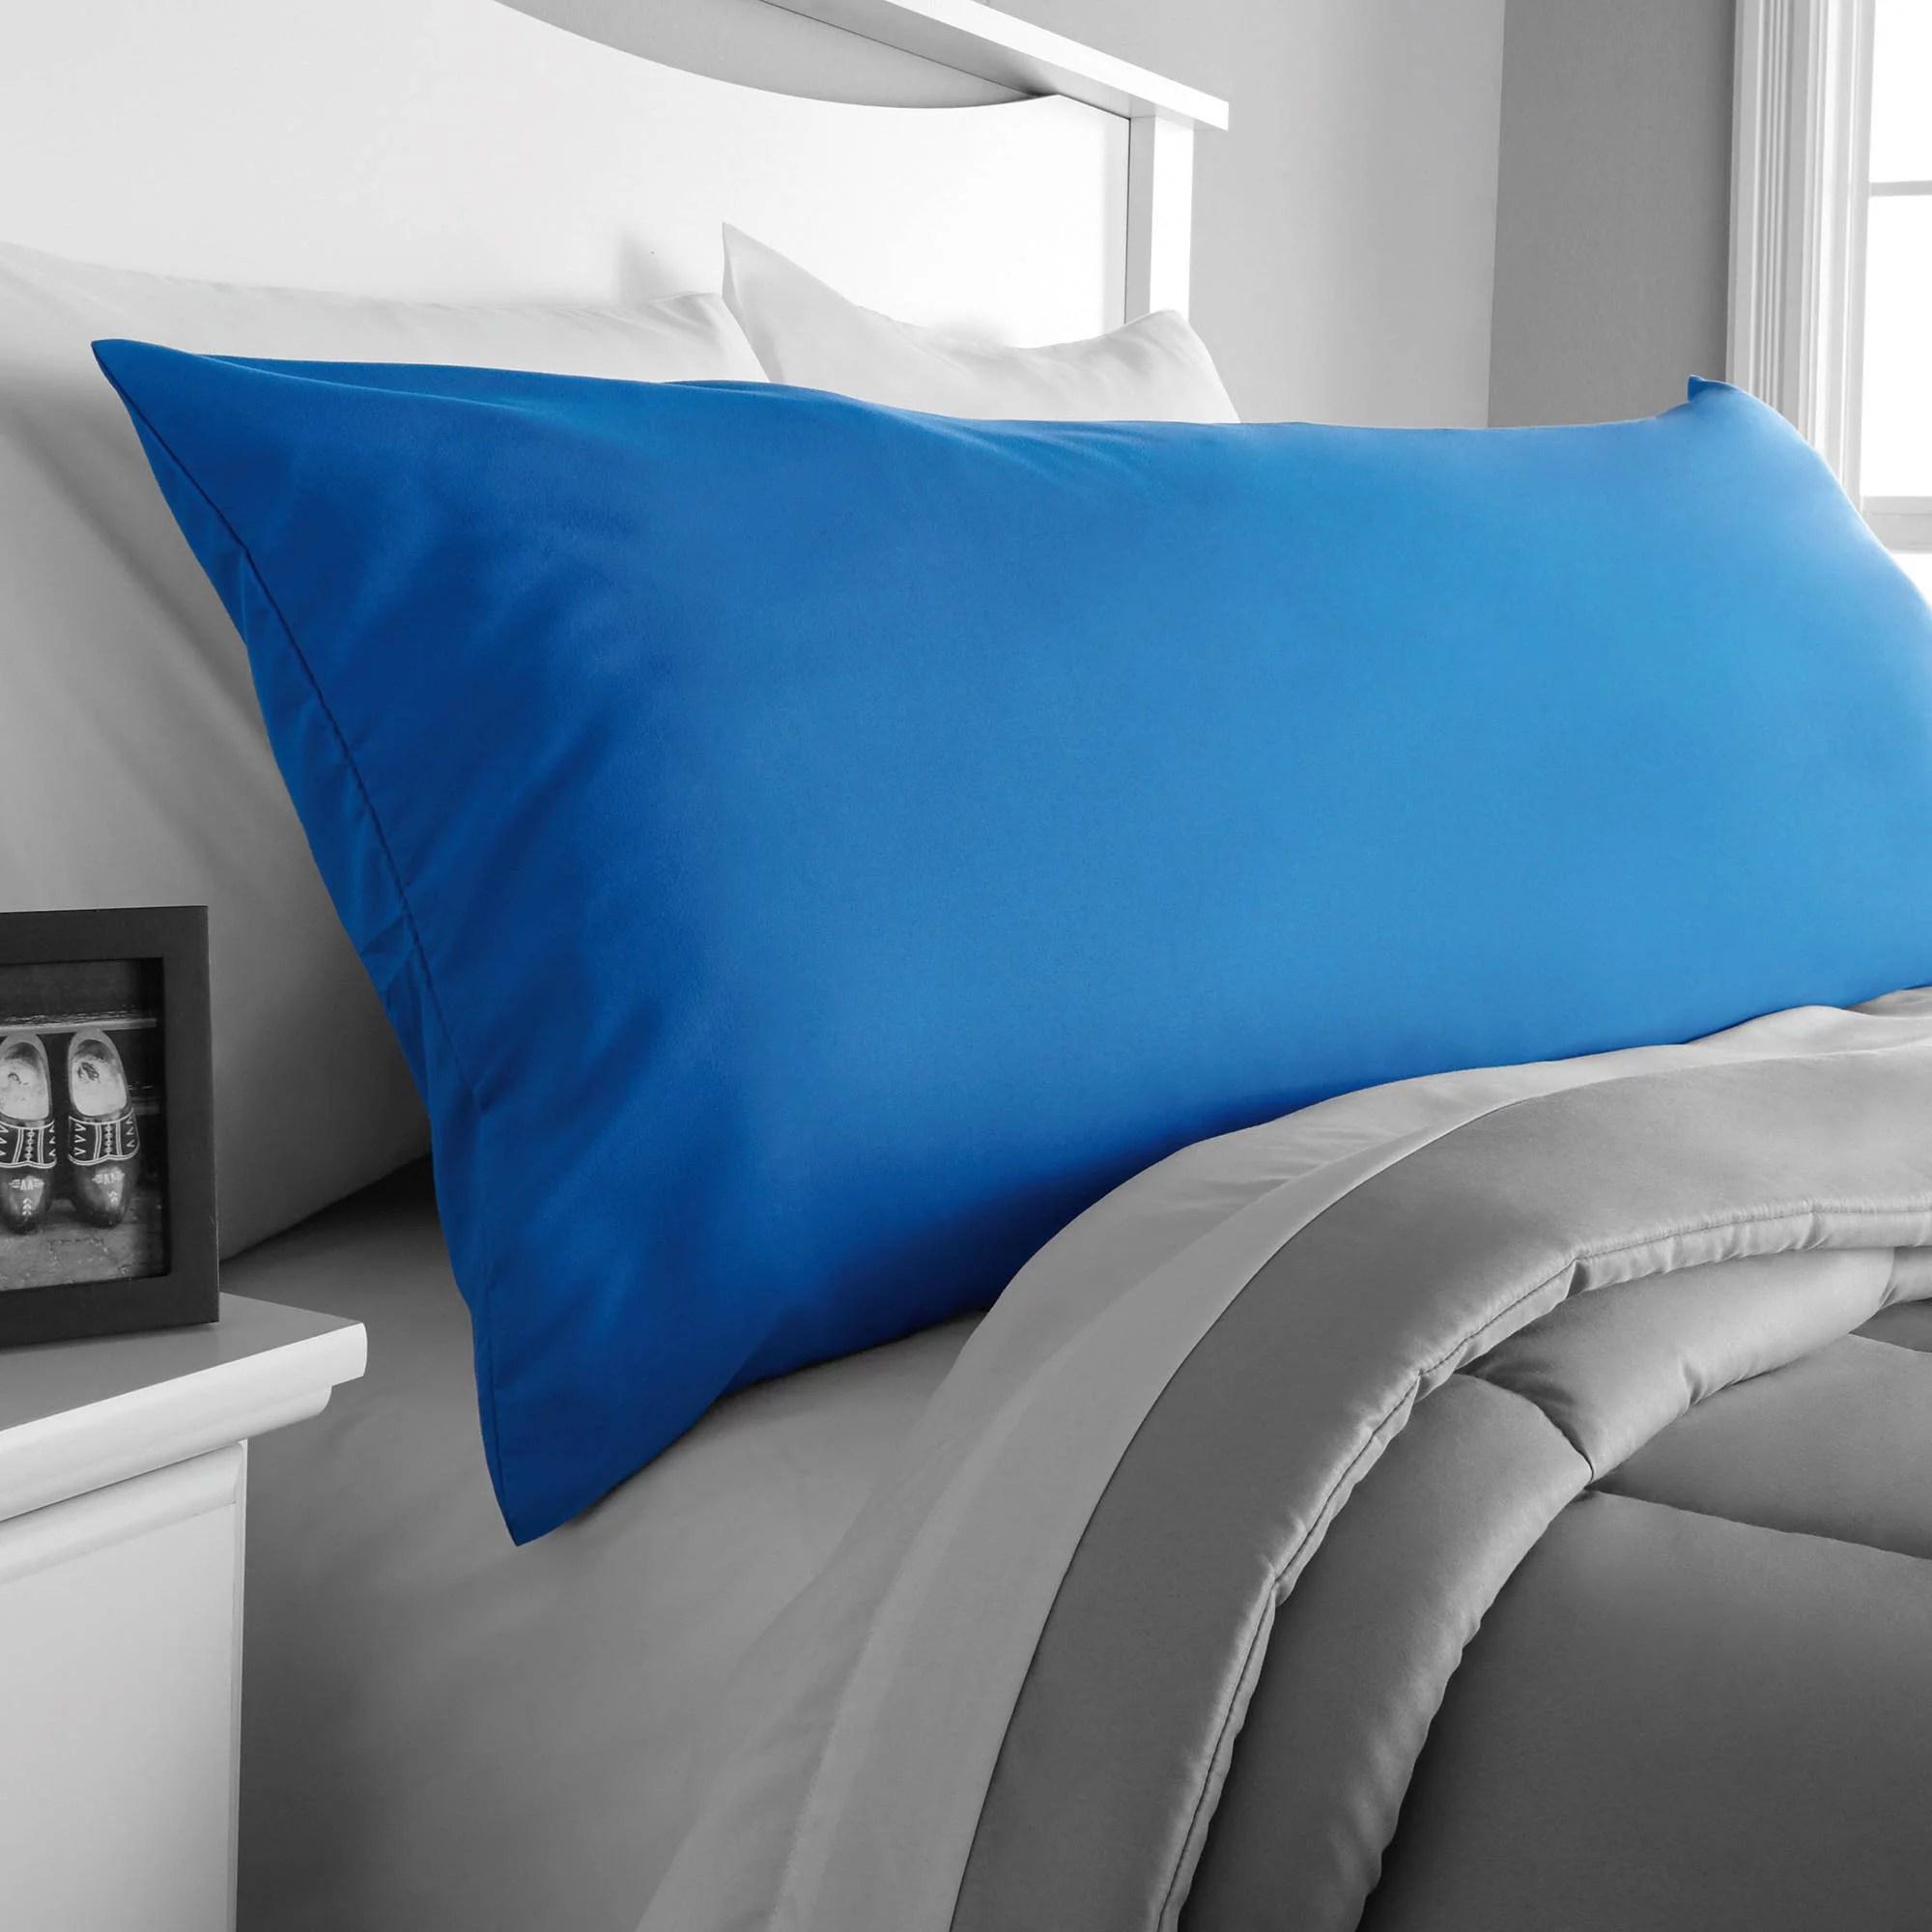 mainstays microfiber 20 x 52 blue body pillow cover 1 each